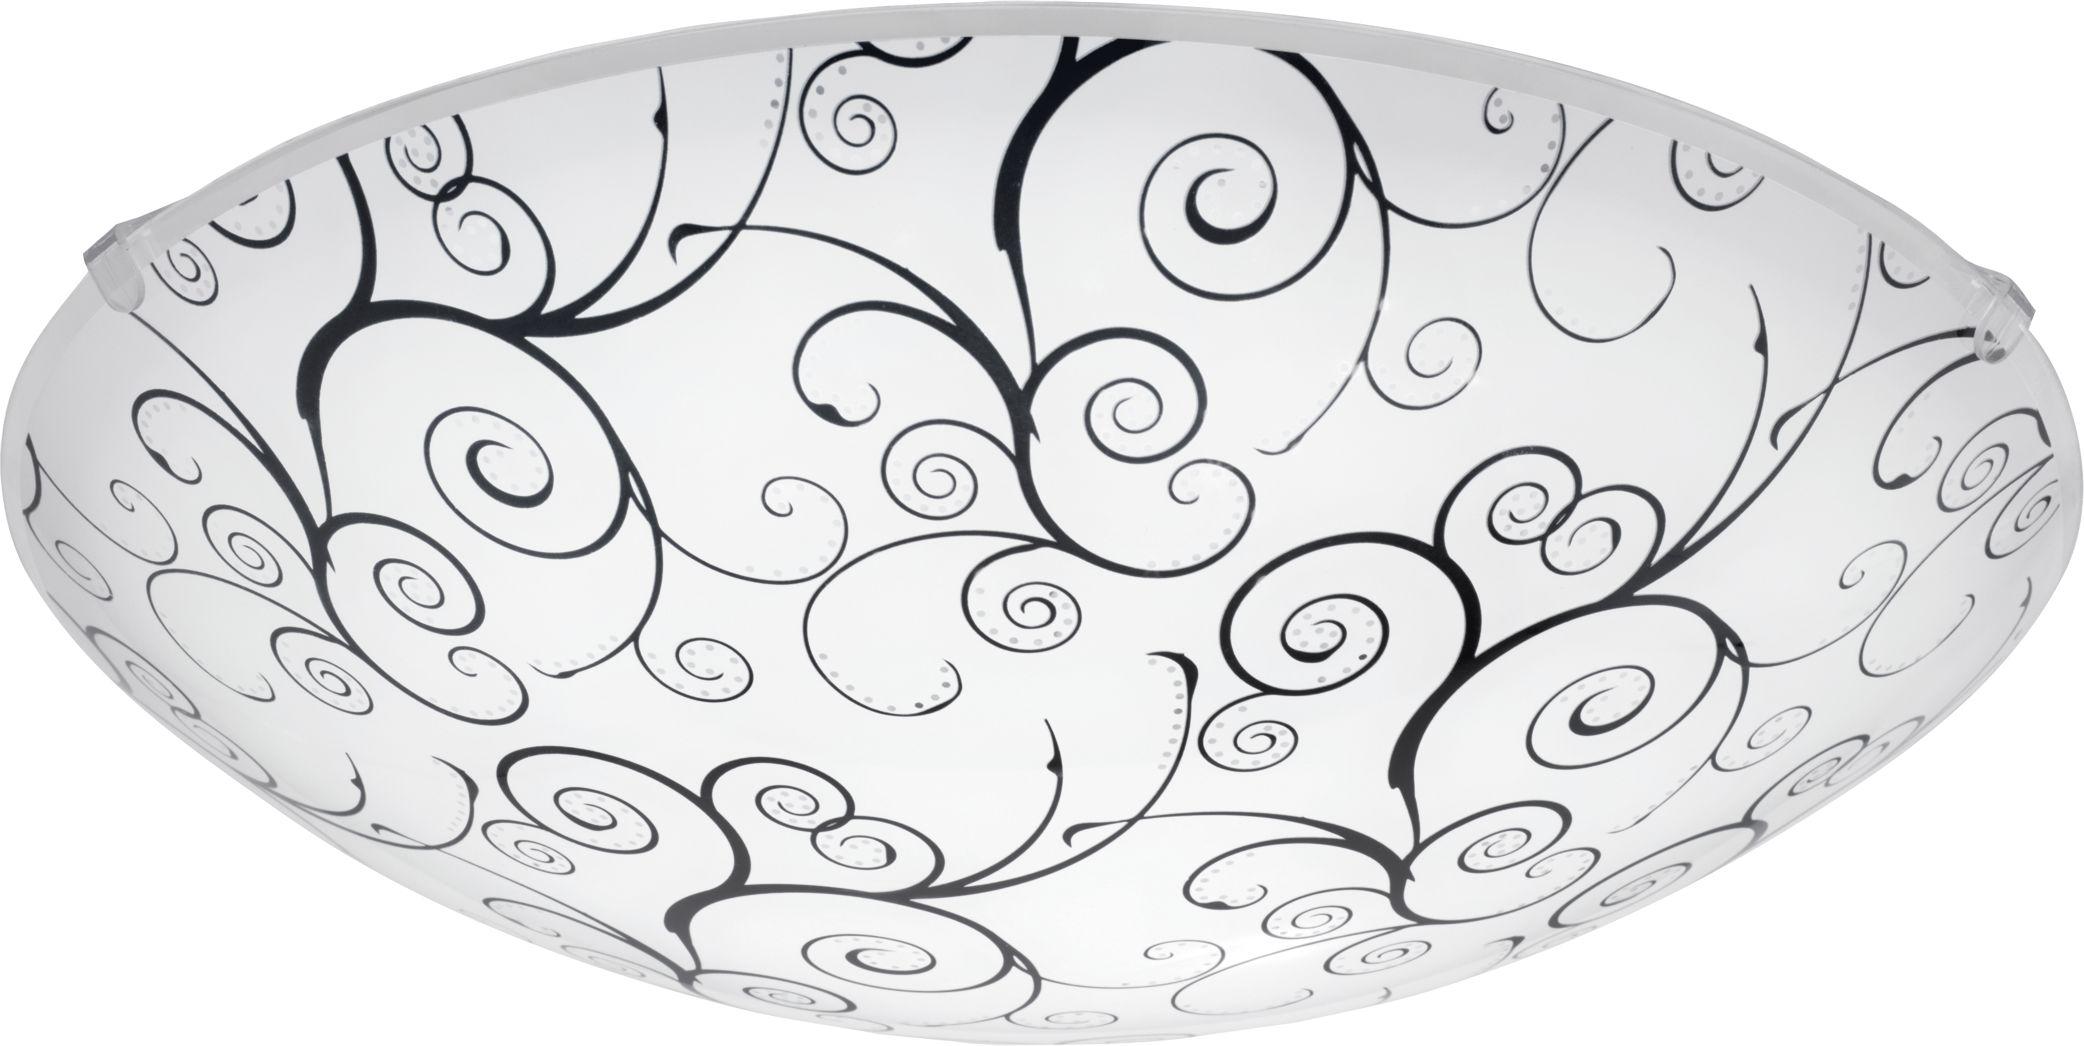 Eglo plafon LED Margitta 1 96117 - SUPER OFERTA - RABAT w koszyku